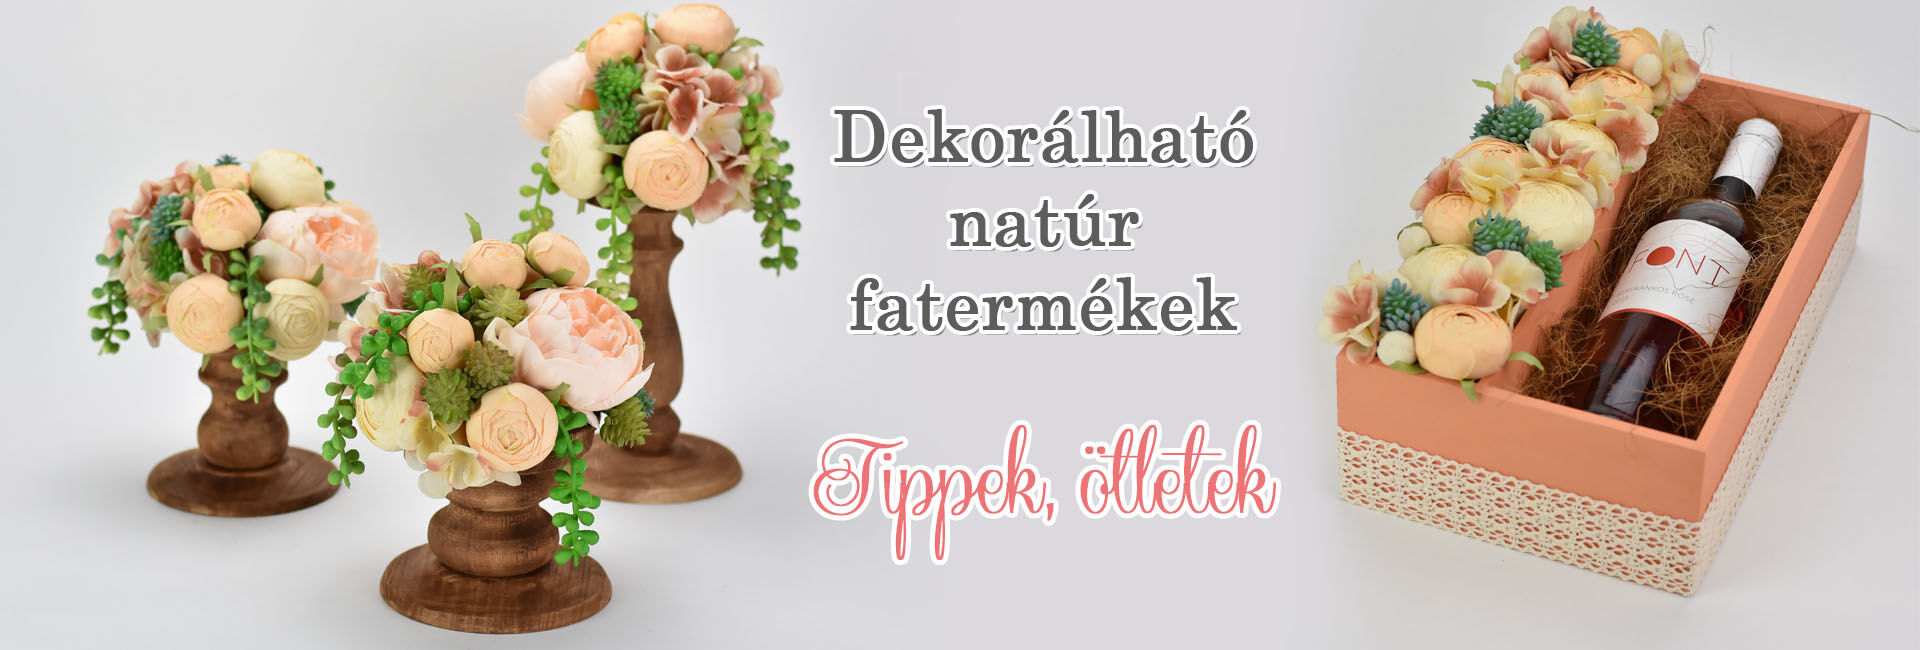 https://www.kosarbolt.hu/kreativ_termekek_150/natur_fa_termekek_235